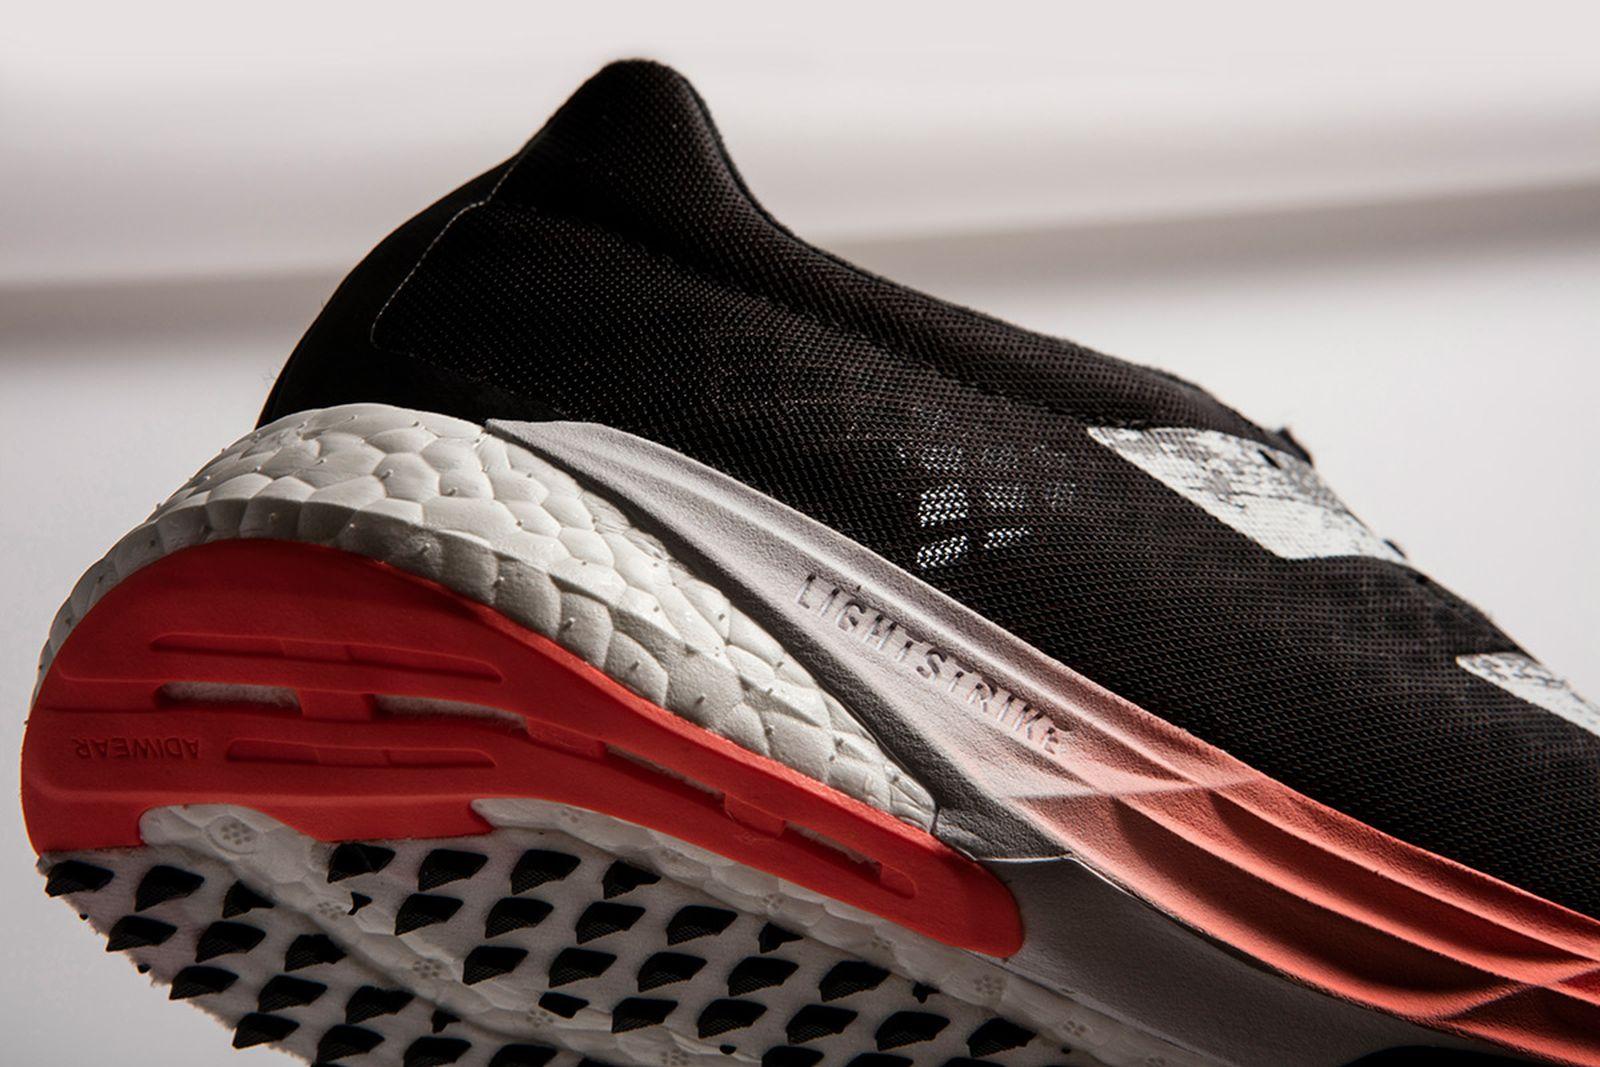 adidas-adizero-pro-release-date-price-01